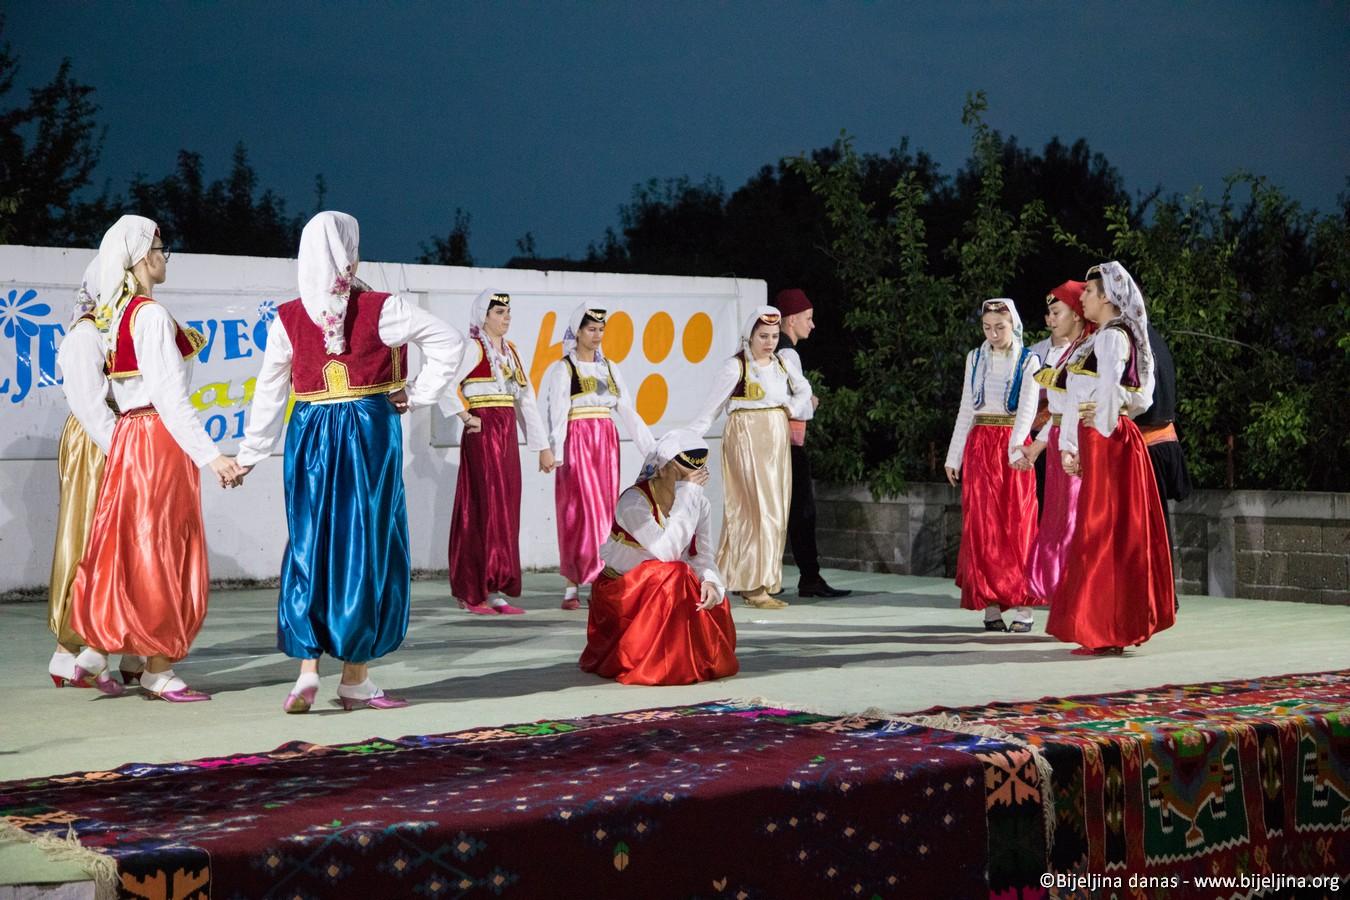 FOTO Ljetne večeri u Janji - praznik kulture i gastronomije